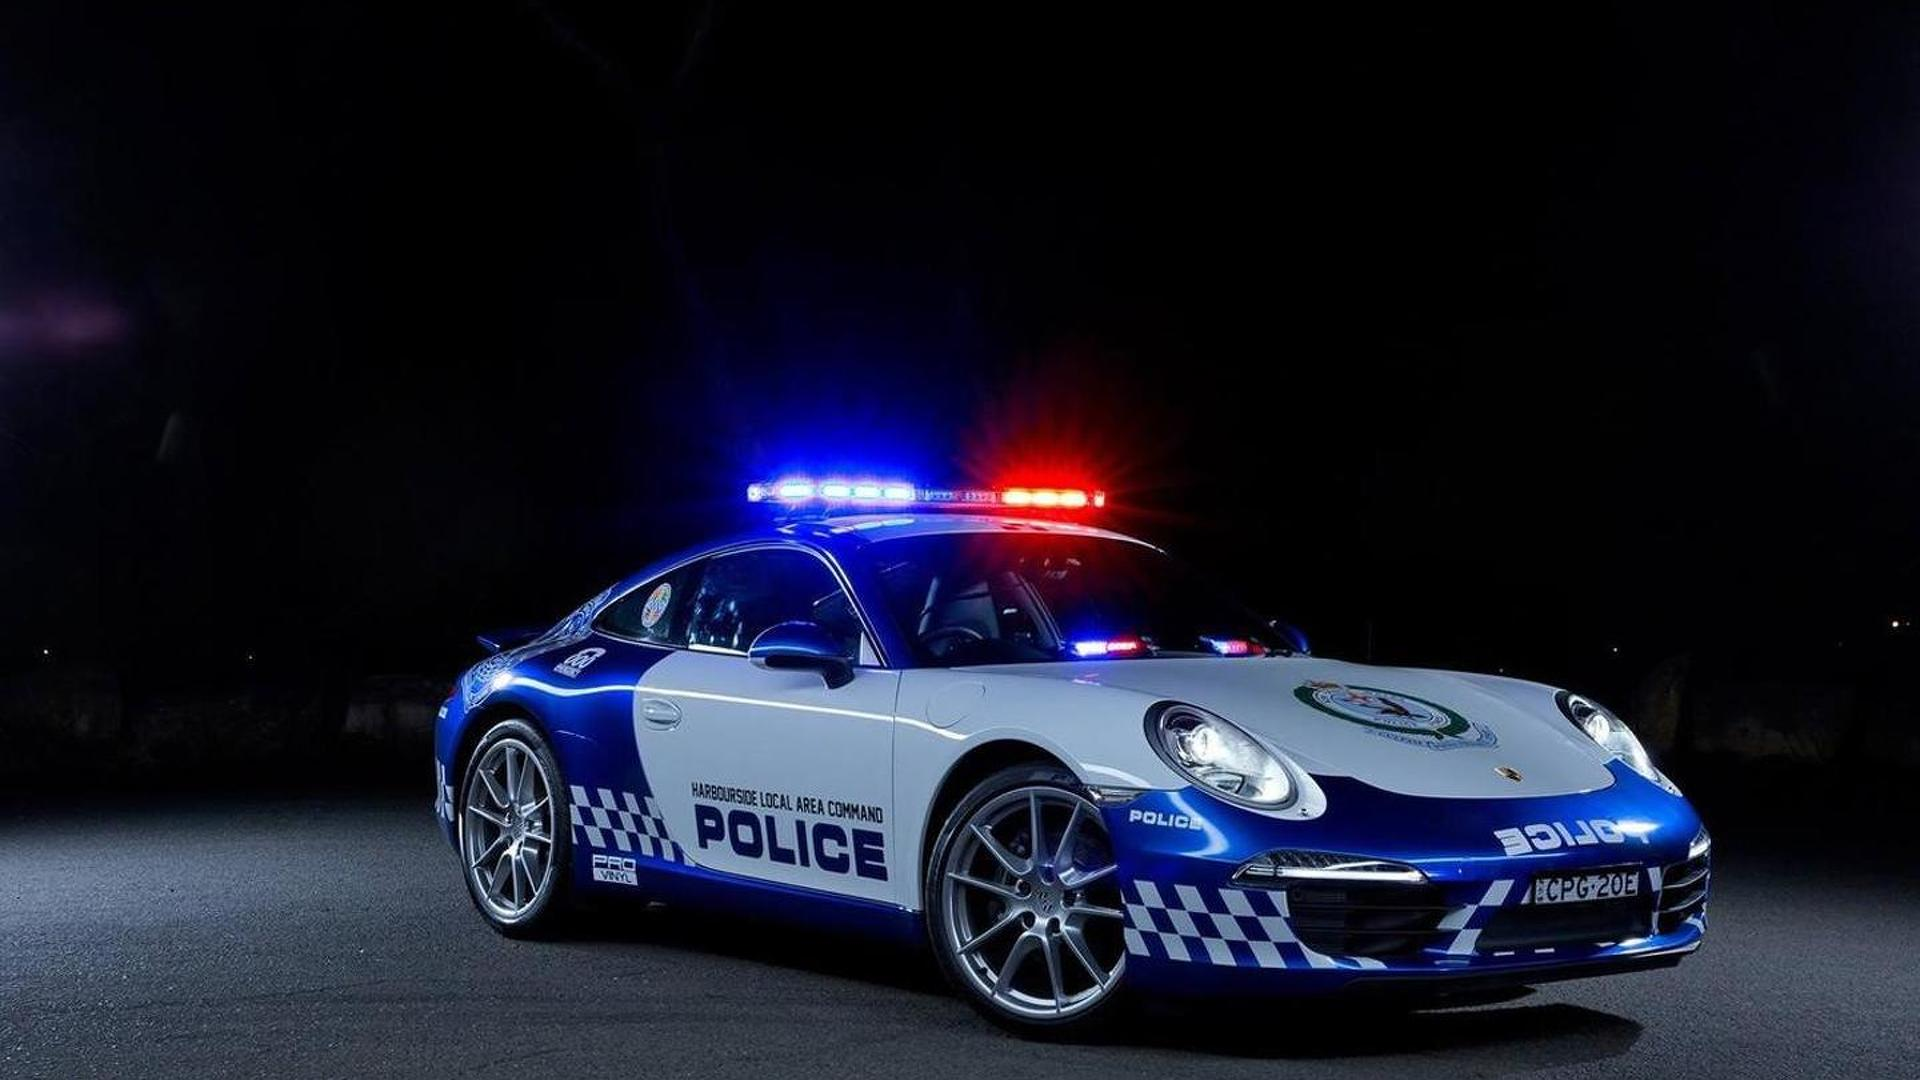 Porsche 911 Carrera для полиции Австралии